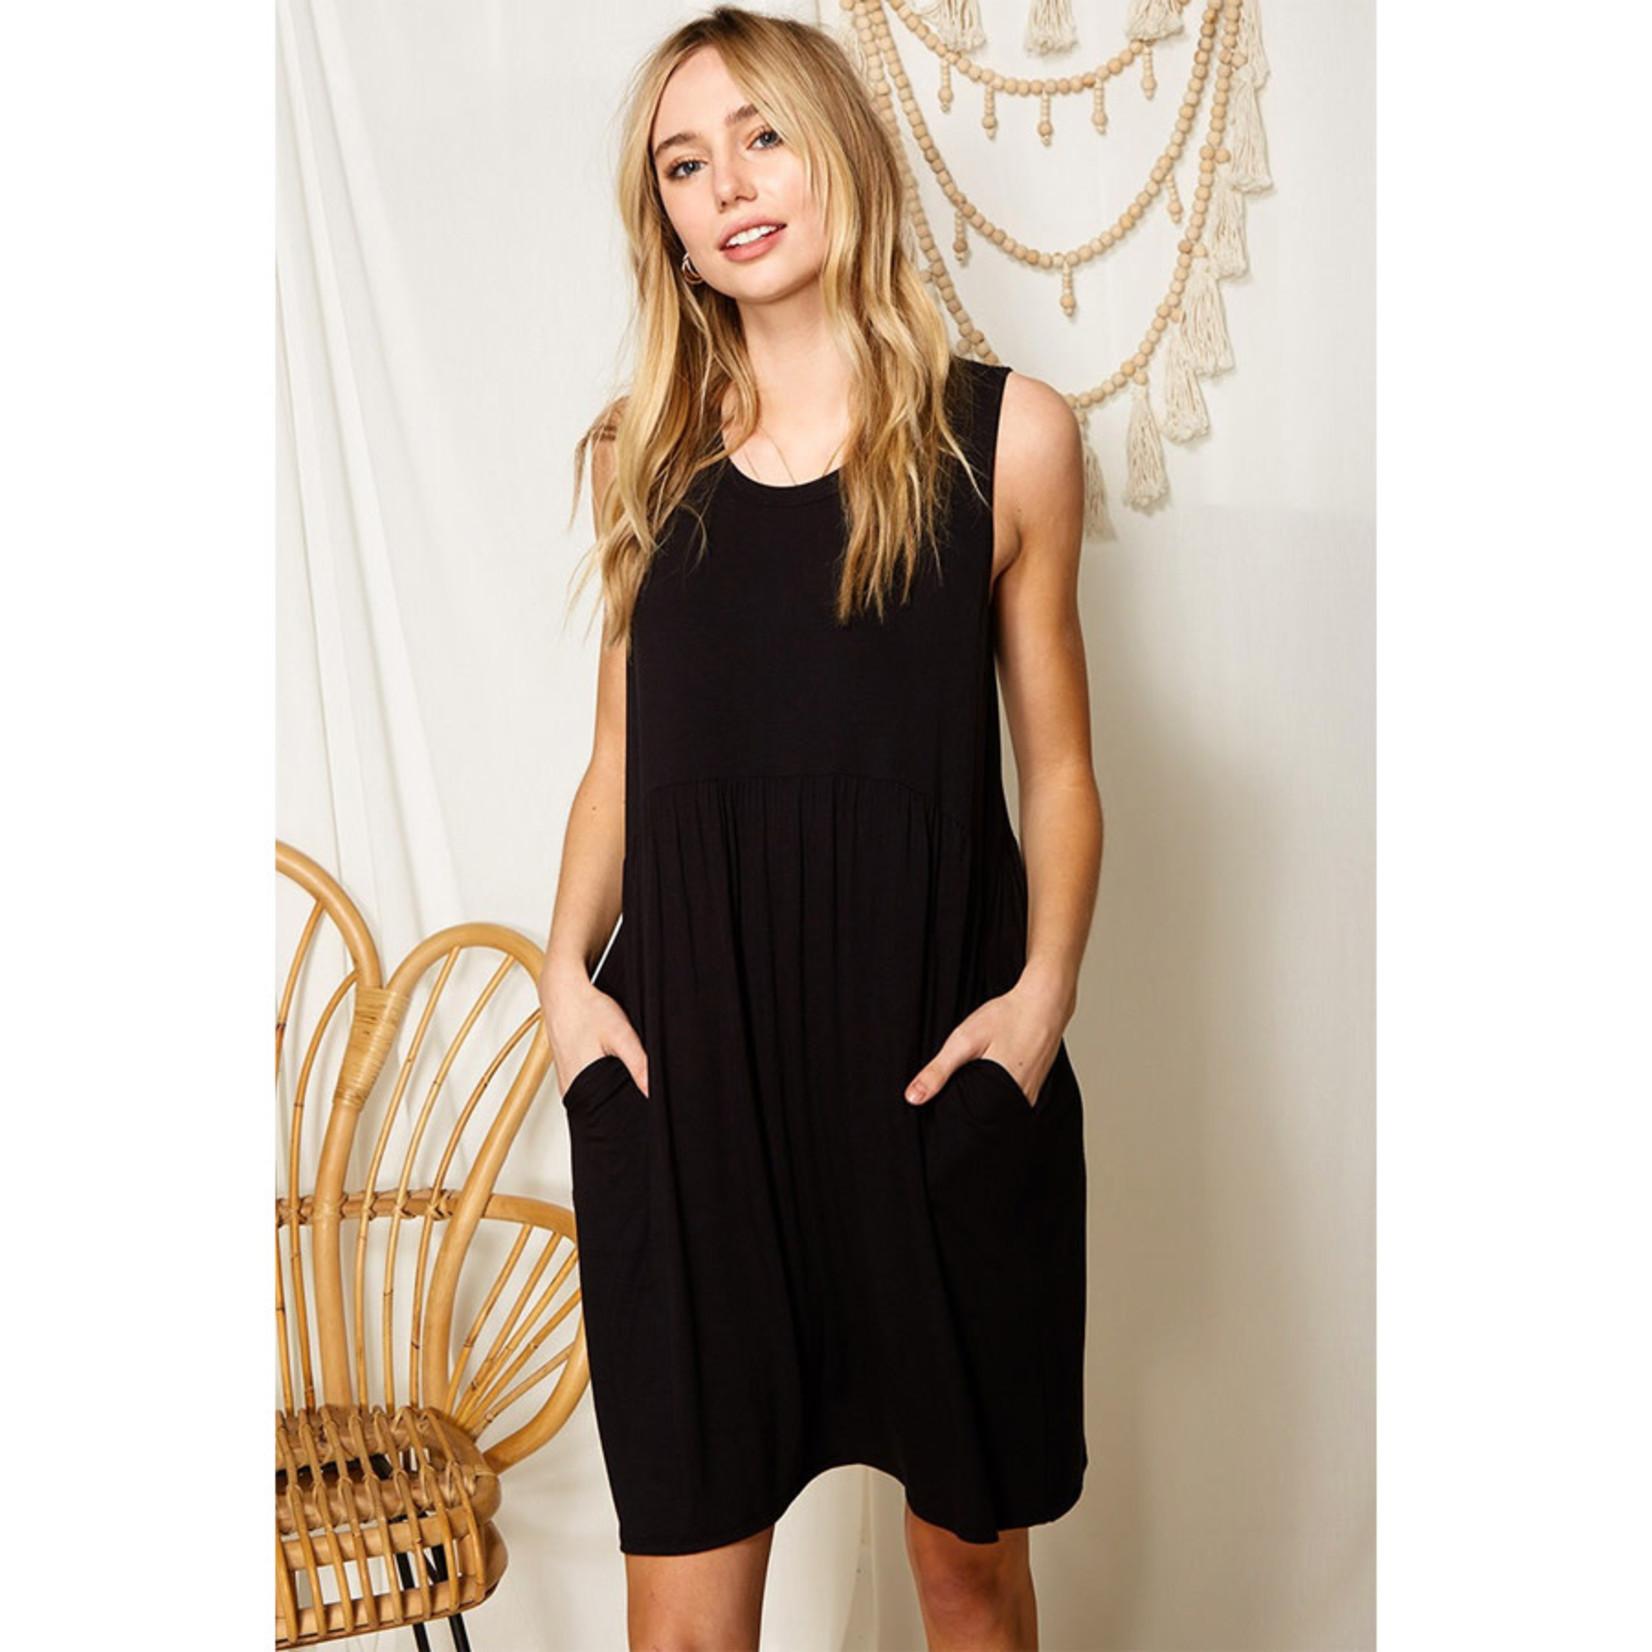 Mittoshop Black Tank Dress w/Pockets